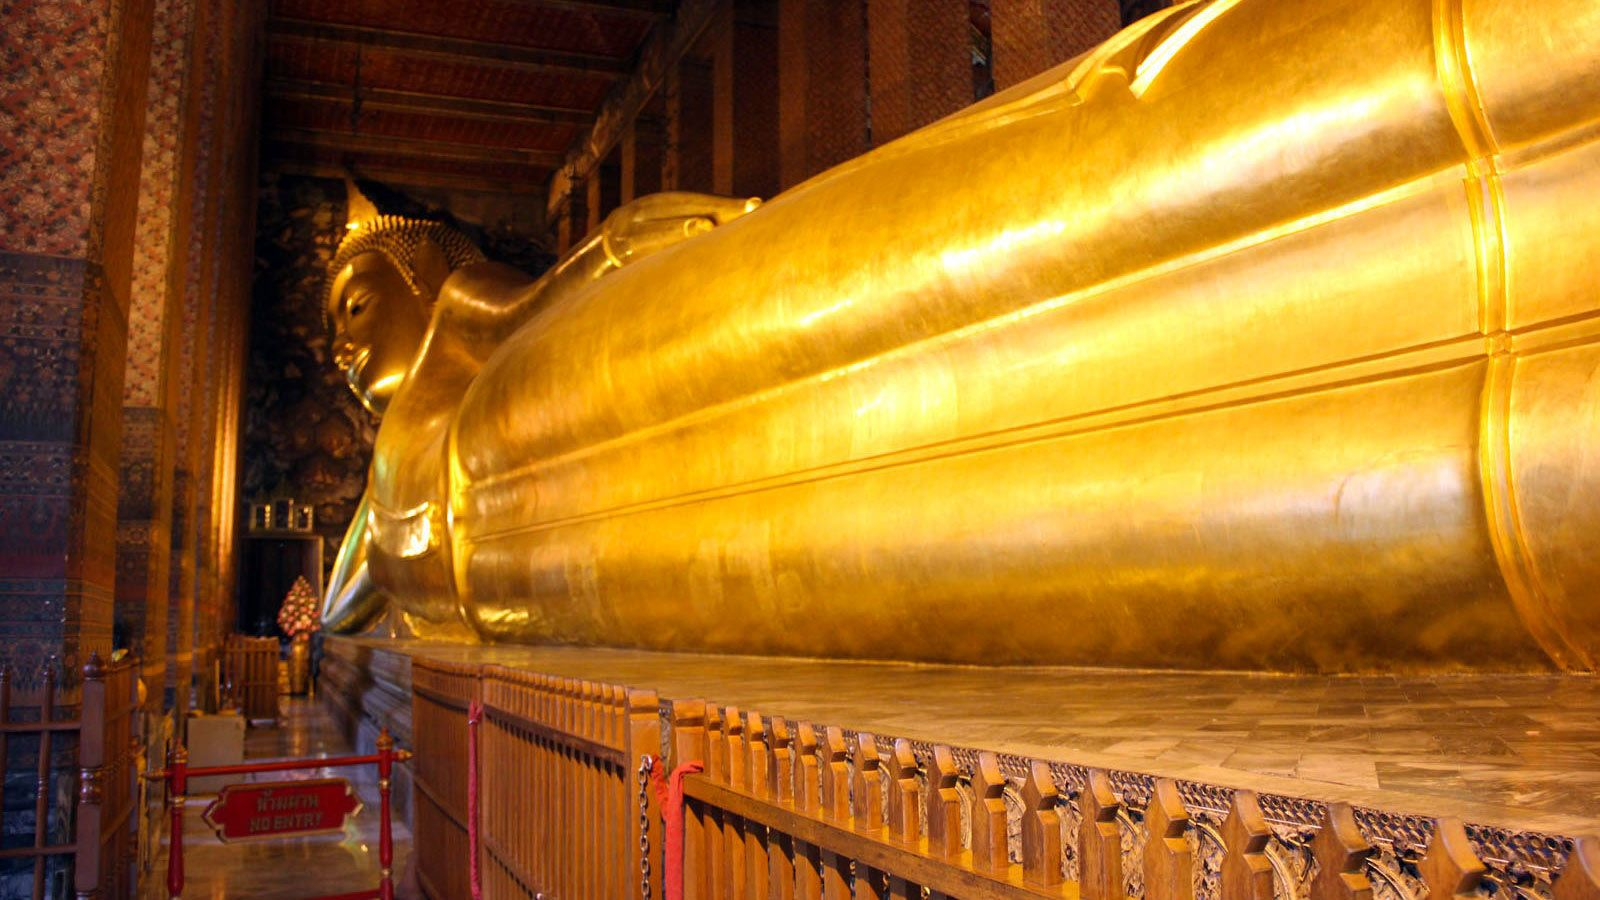 View of the reclining Buddha in Bangkok